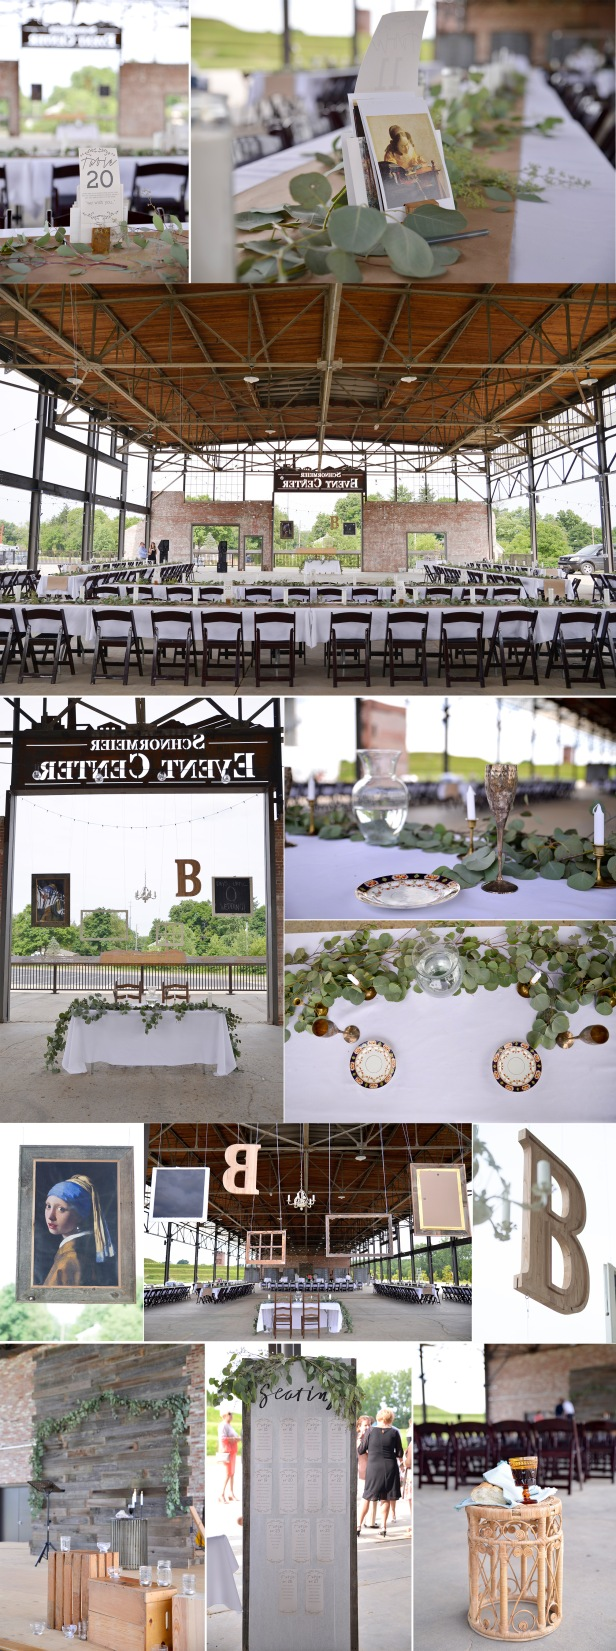 7-wedding in event center foundation park mt vernon ohio